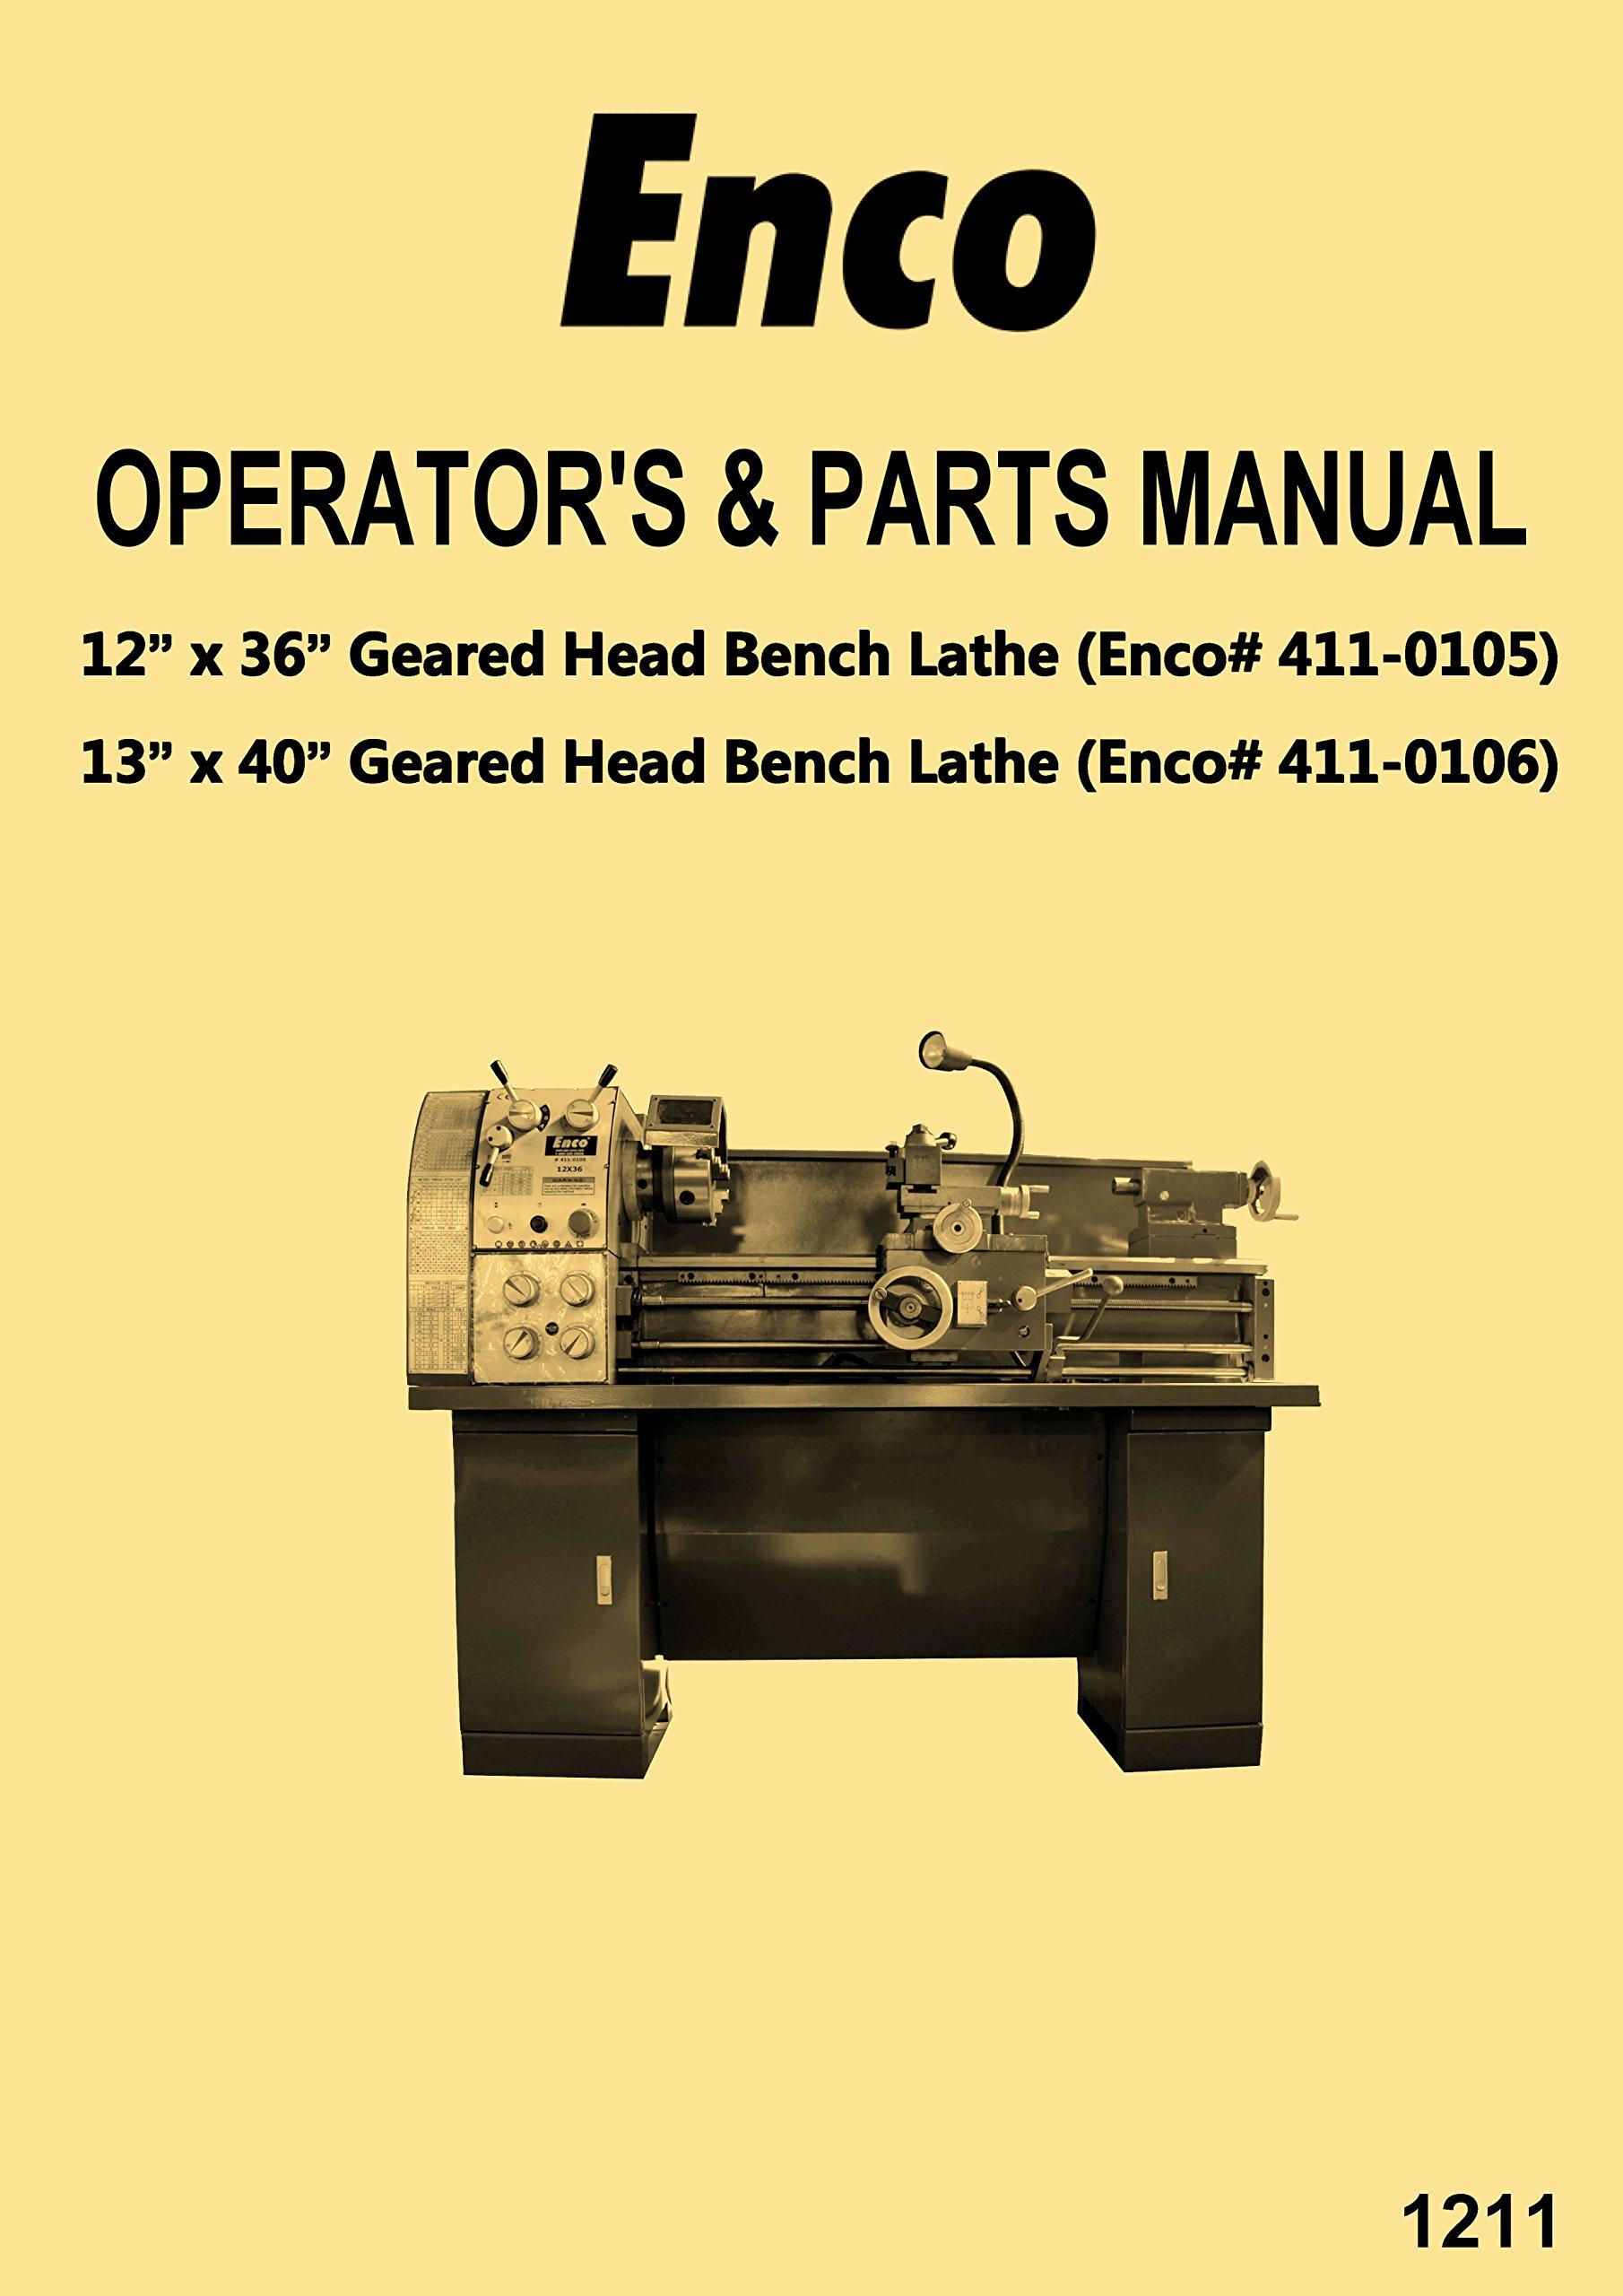 Enco-JET-Asian 1236 1340 Metal Lathes 411-0105 411-0106 Instructions  Operator's & Parts Manual: Misc.: Amazon.com: BooksAmazon.com